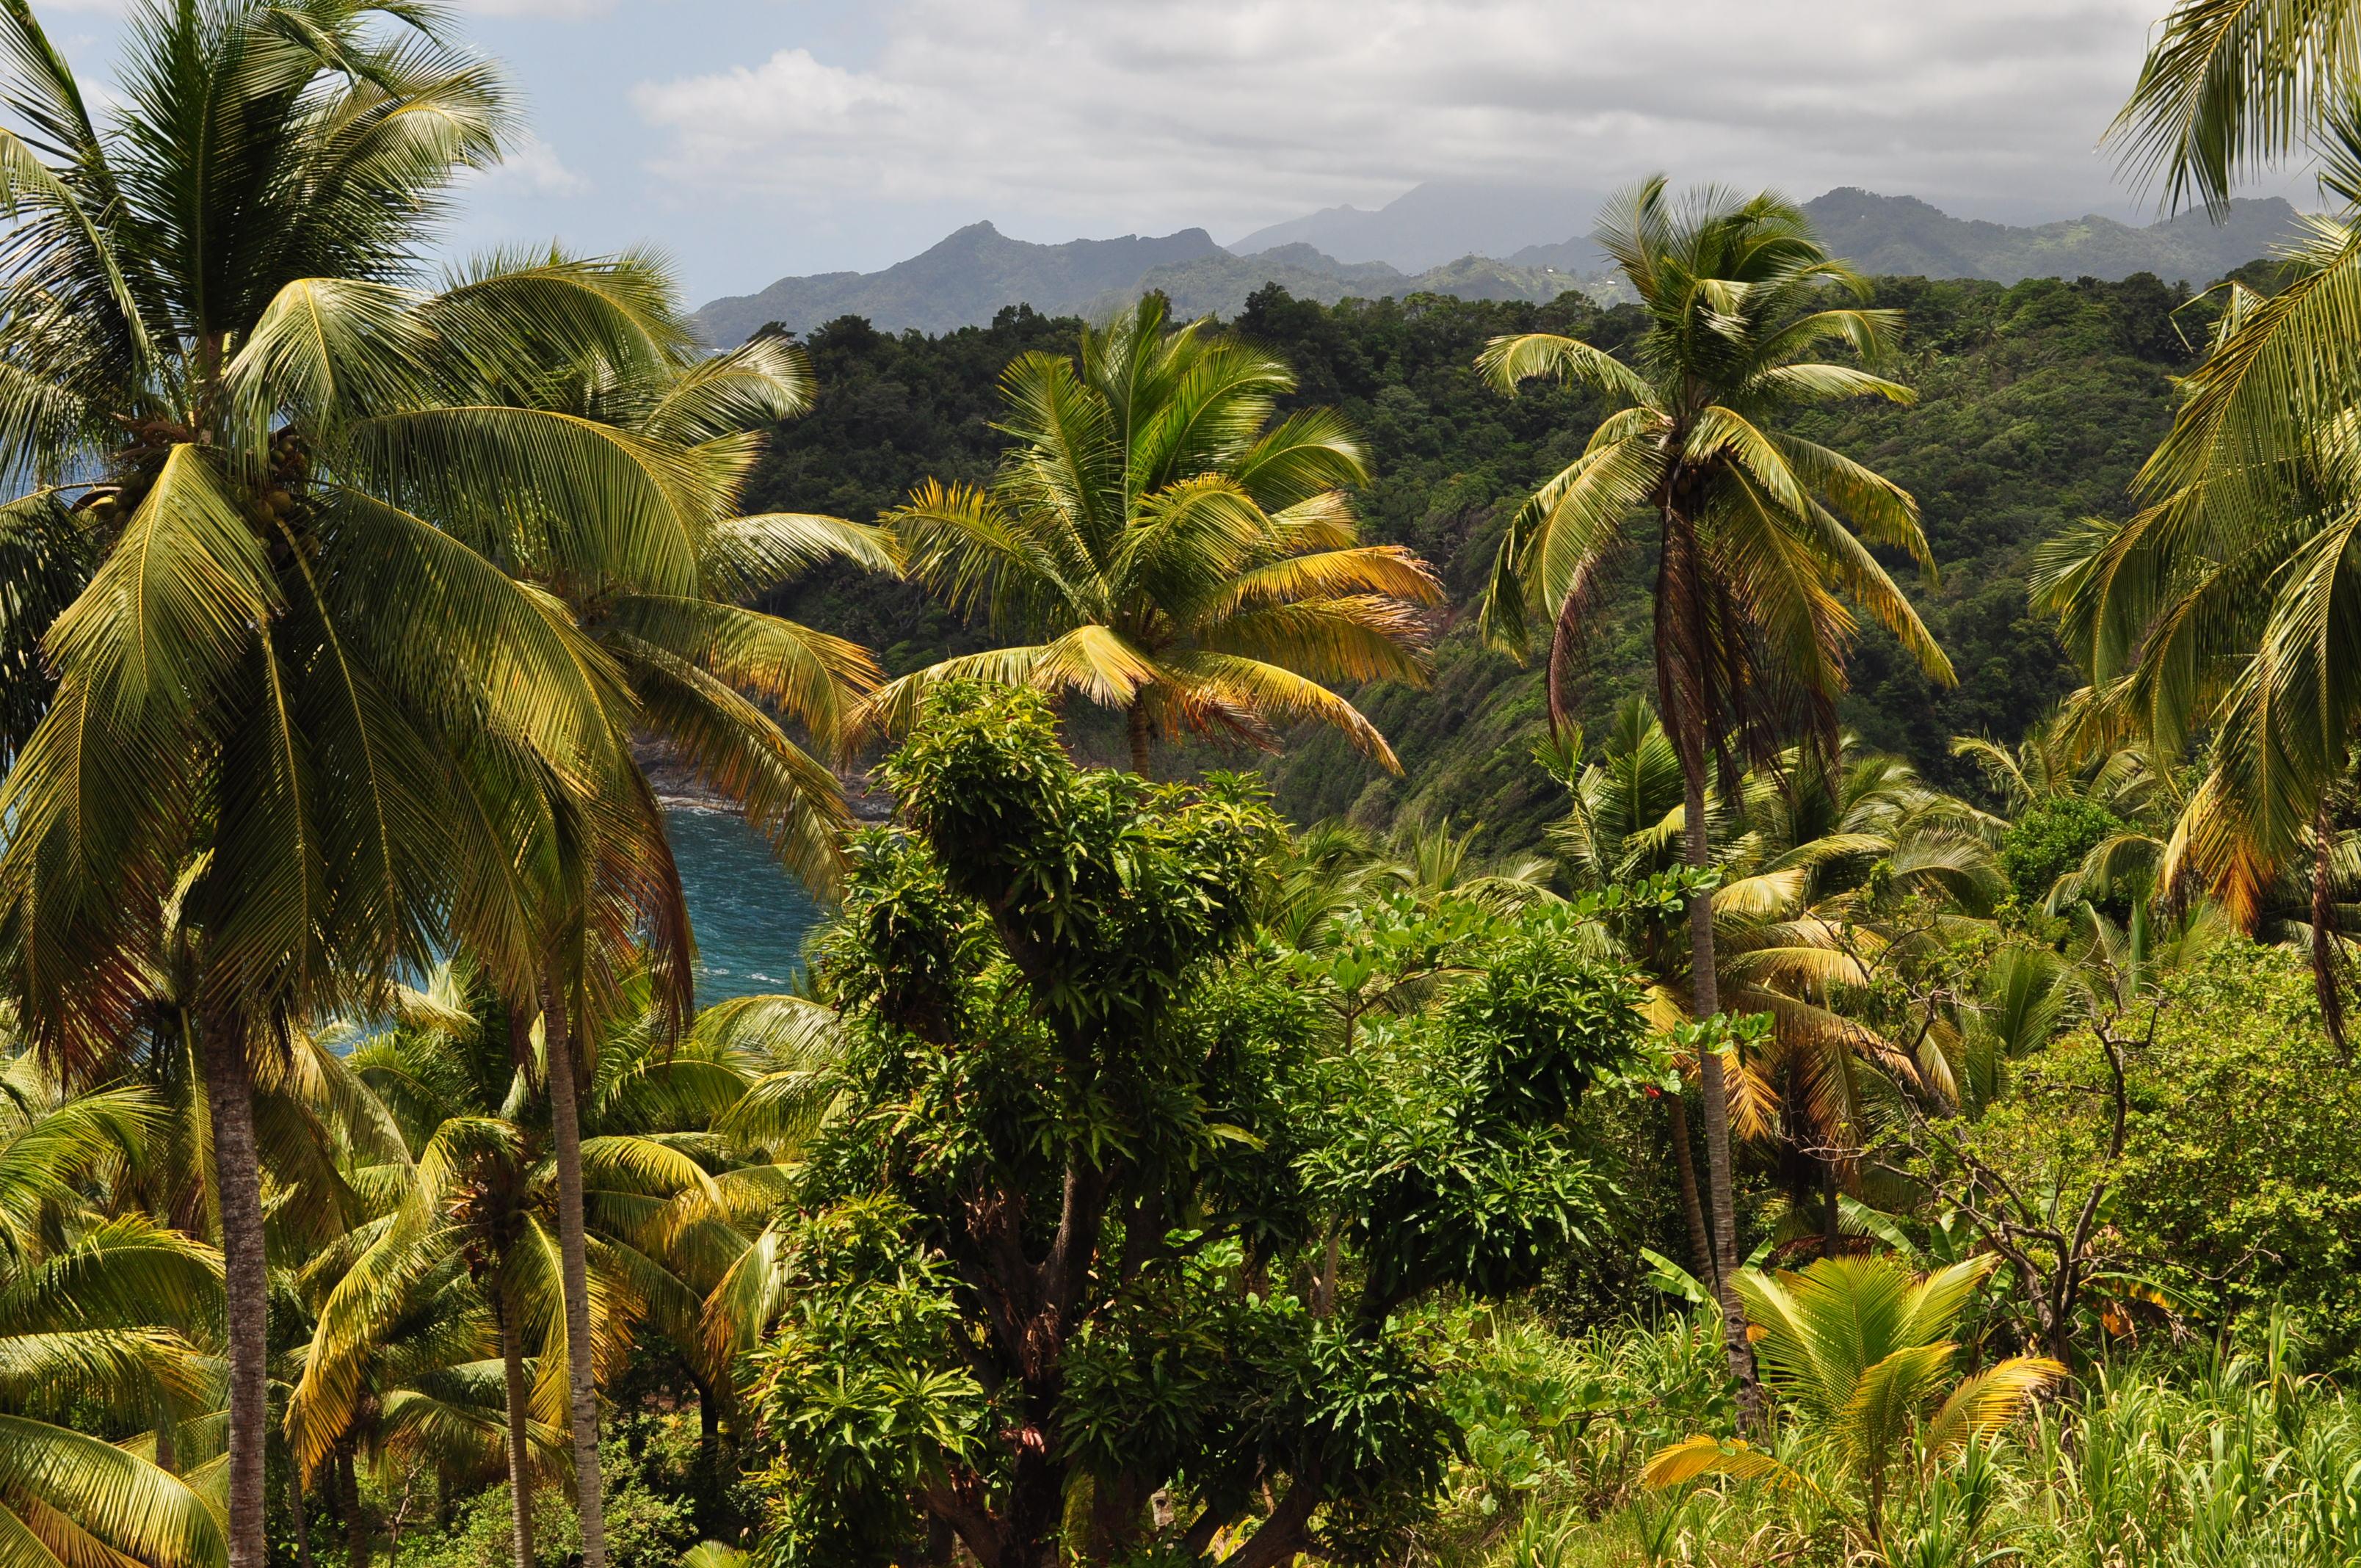 Okolice Castle Bruce, blisko Terytorium Karaibów, wyspa Dominika